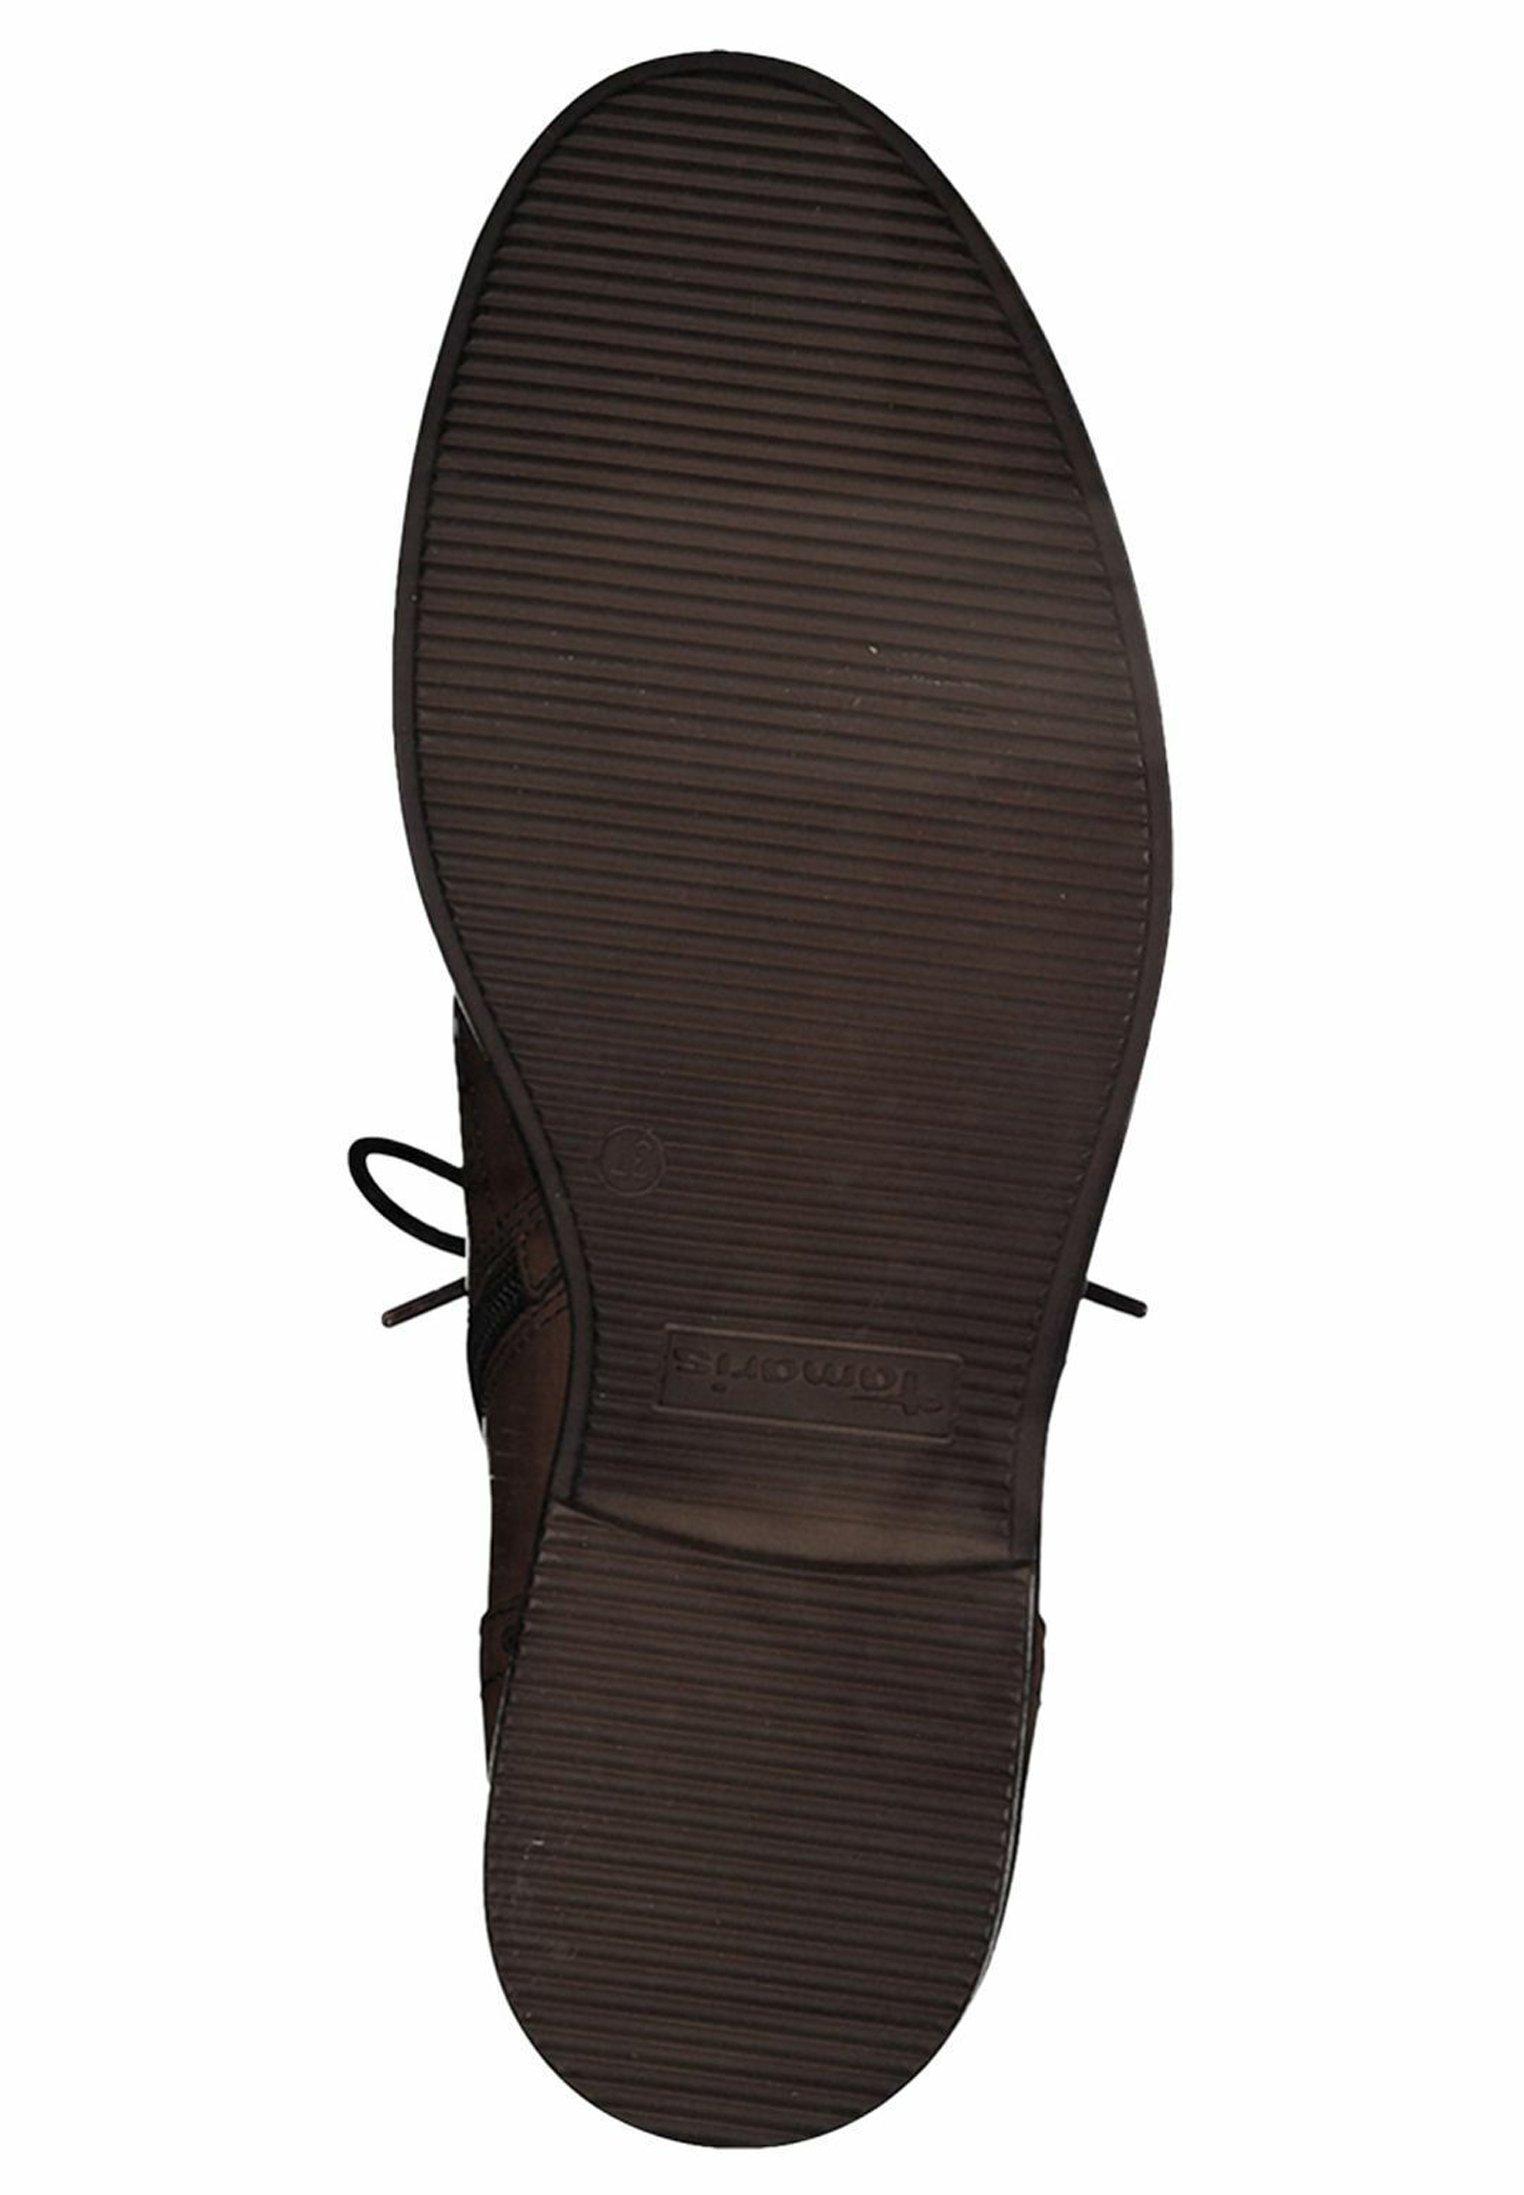 Tamaris Schnürstiefelette - cognac | Damen Schuhe 2020